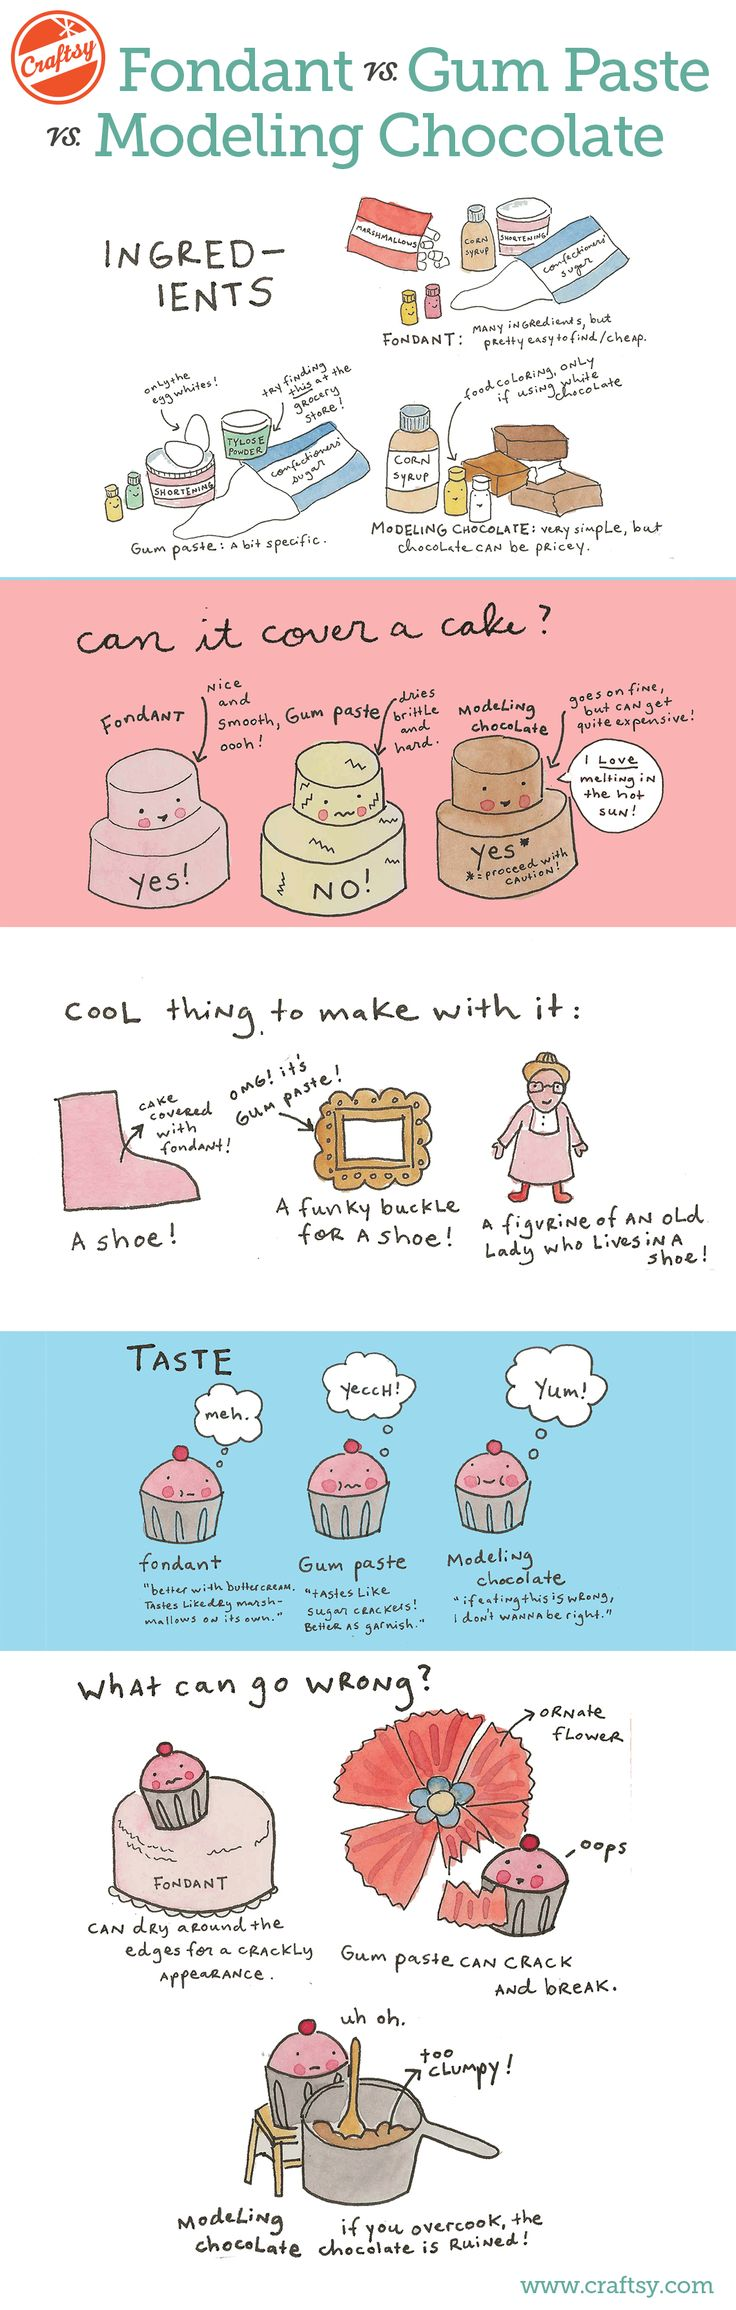 sugarpaste vs fondant